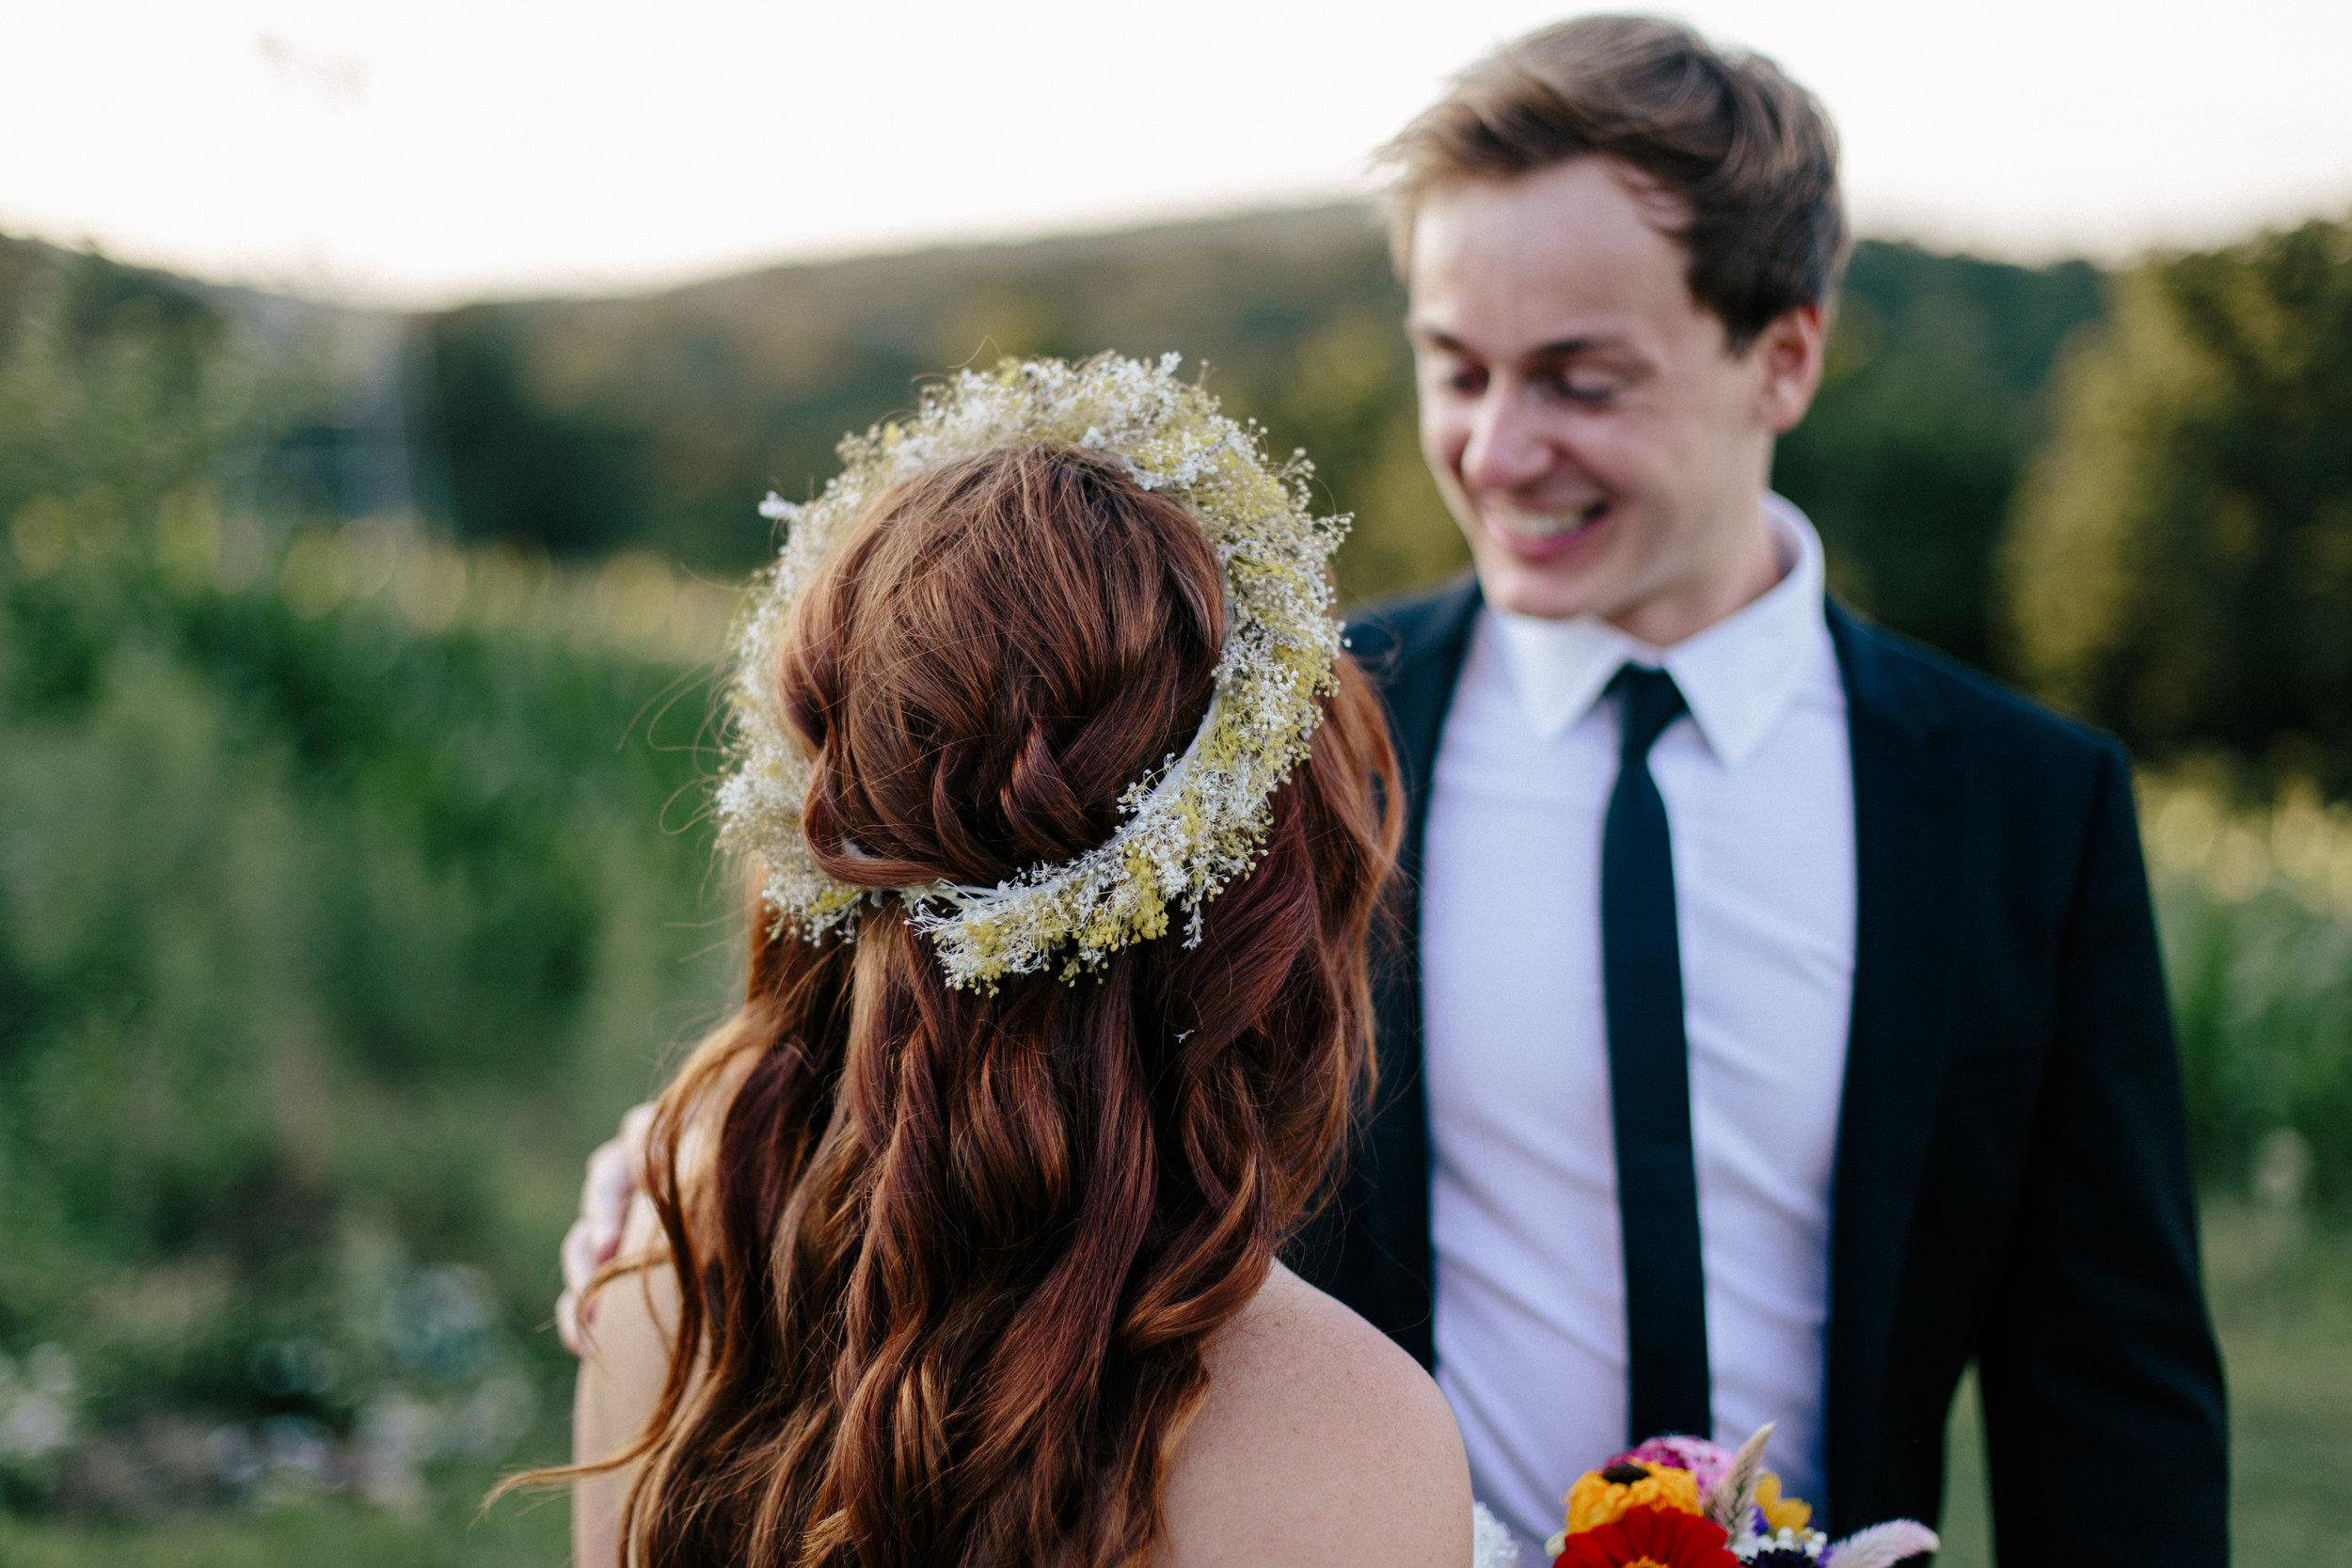 saundra_megan_wedding_photography9-4.jpg